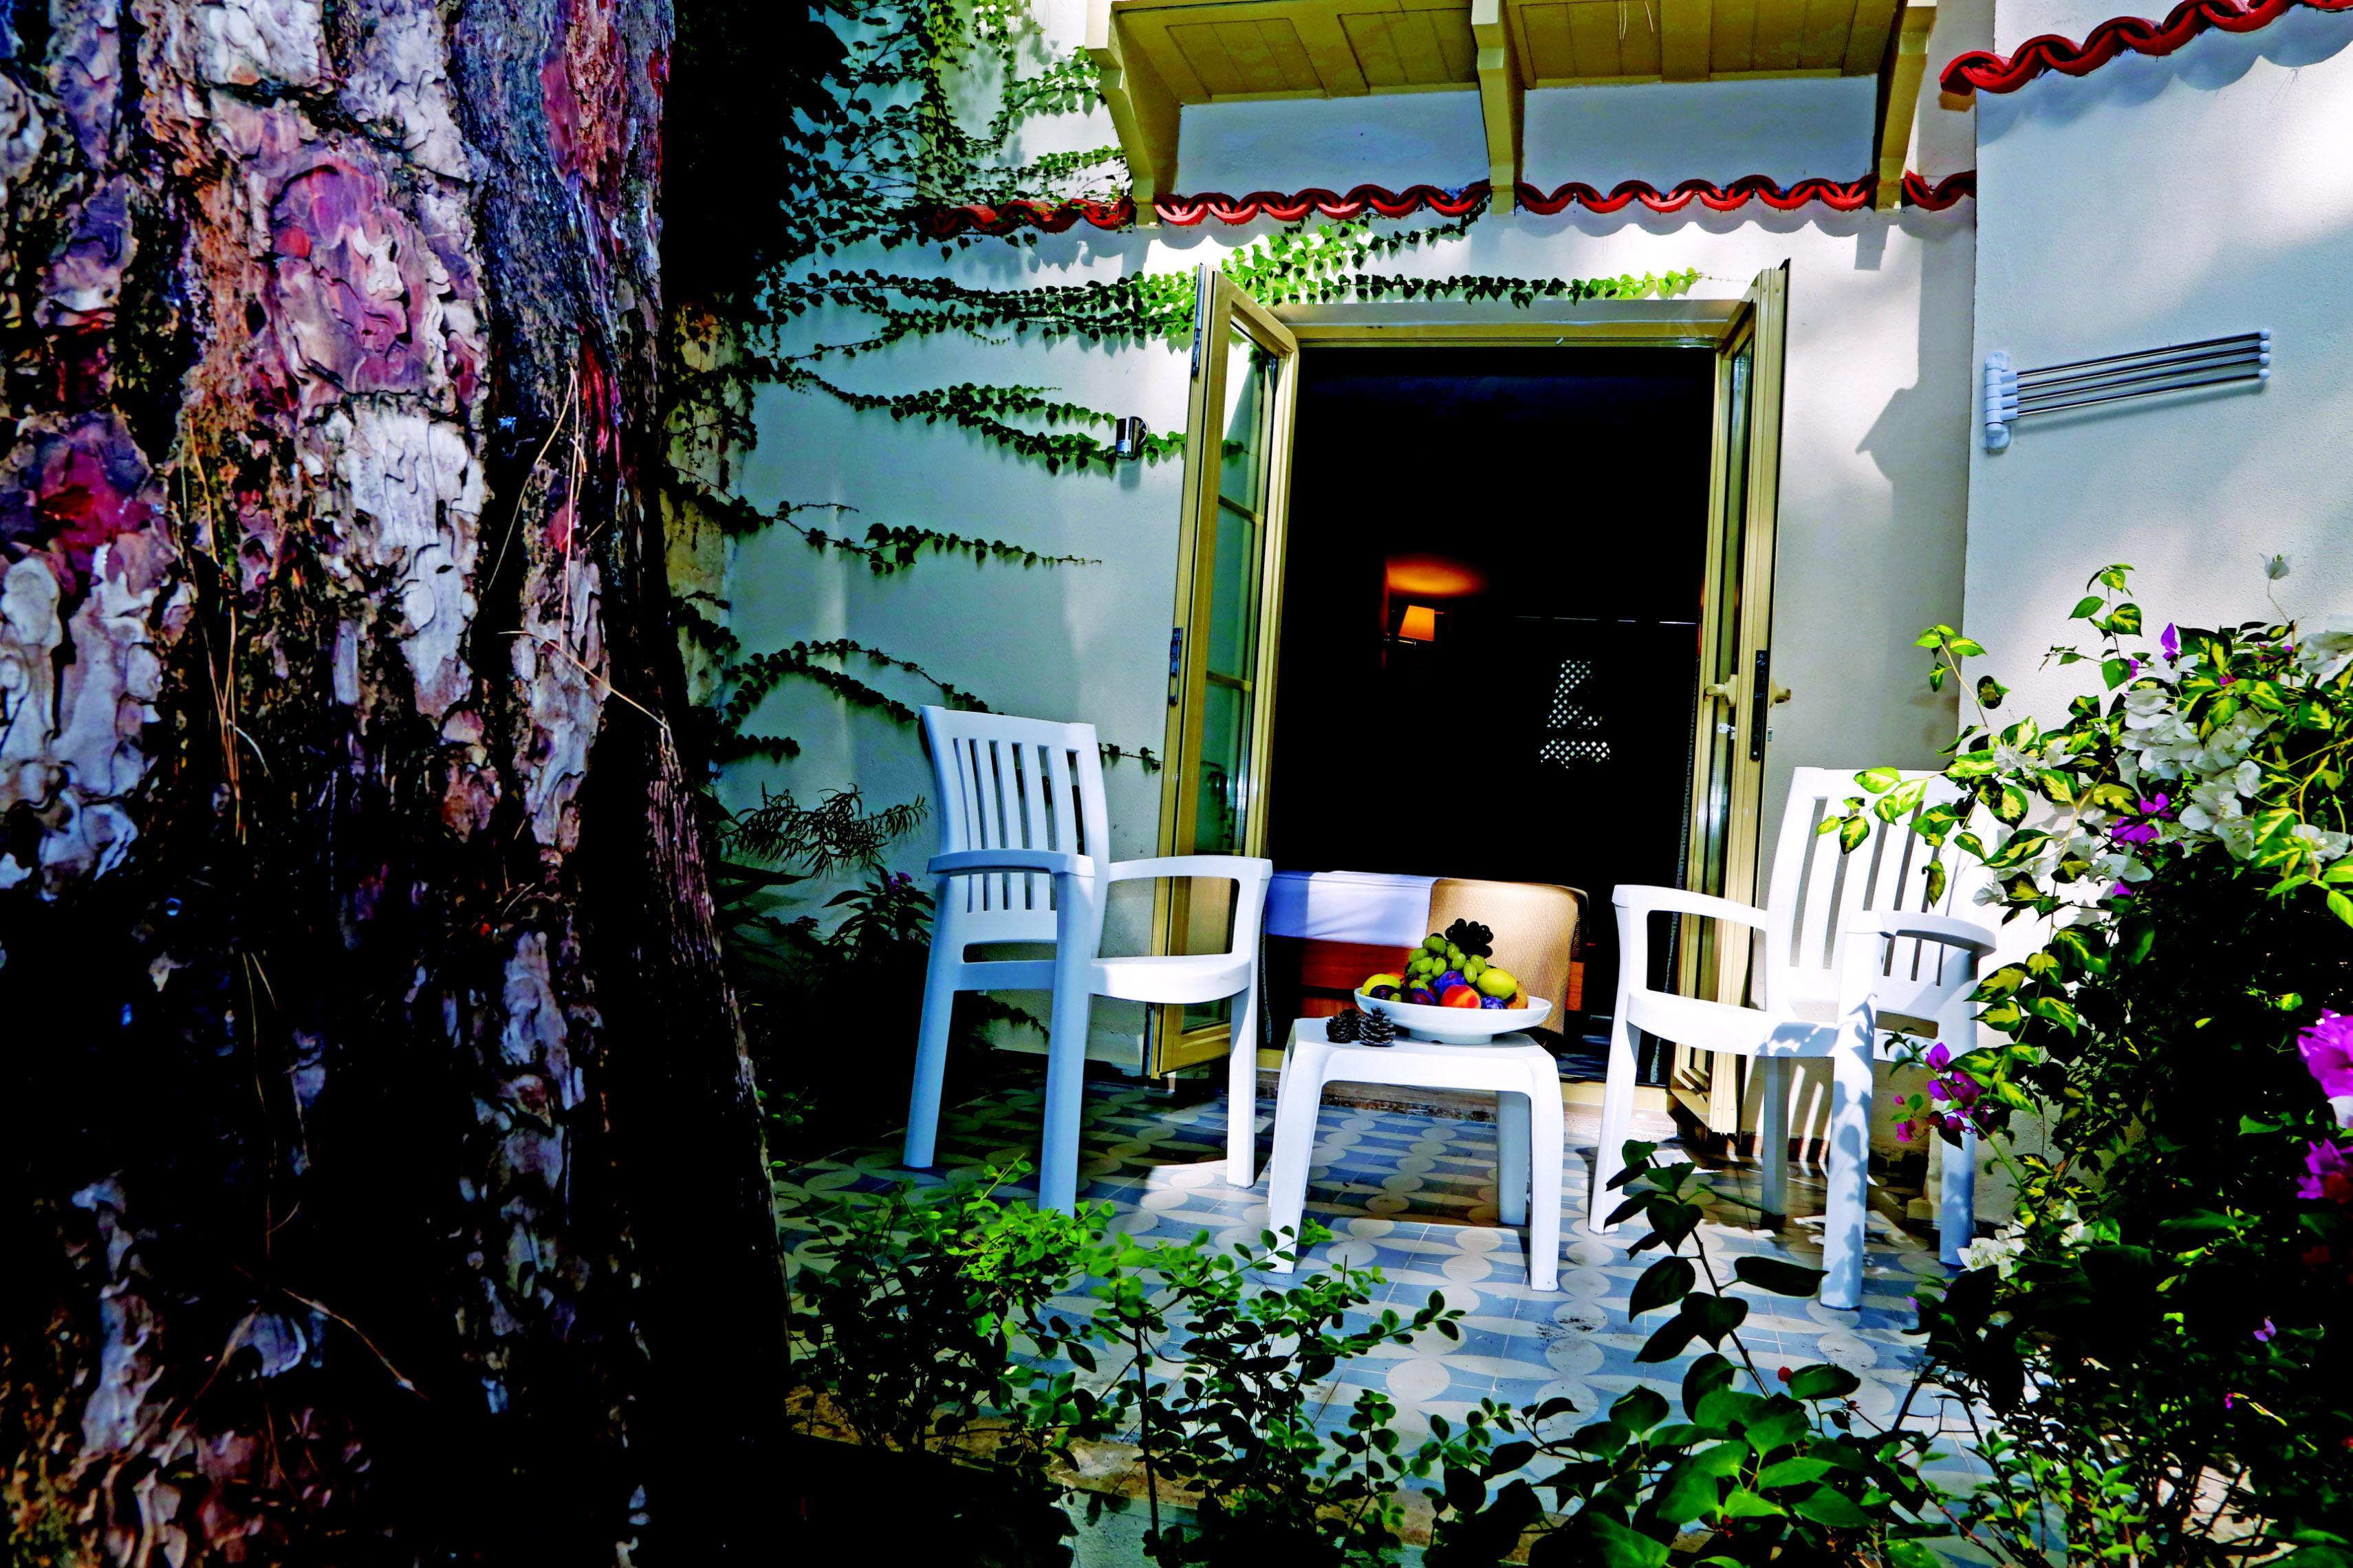 http://www.orextravel.sk/OREX/hotelphotos/ulusoy-kemer-holiday-club-area-0041.jpg